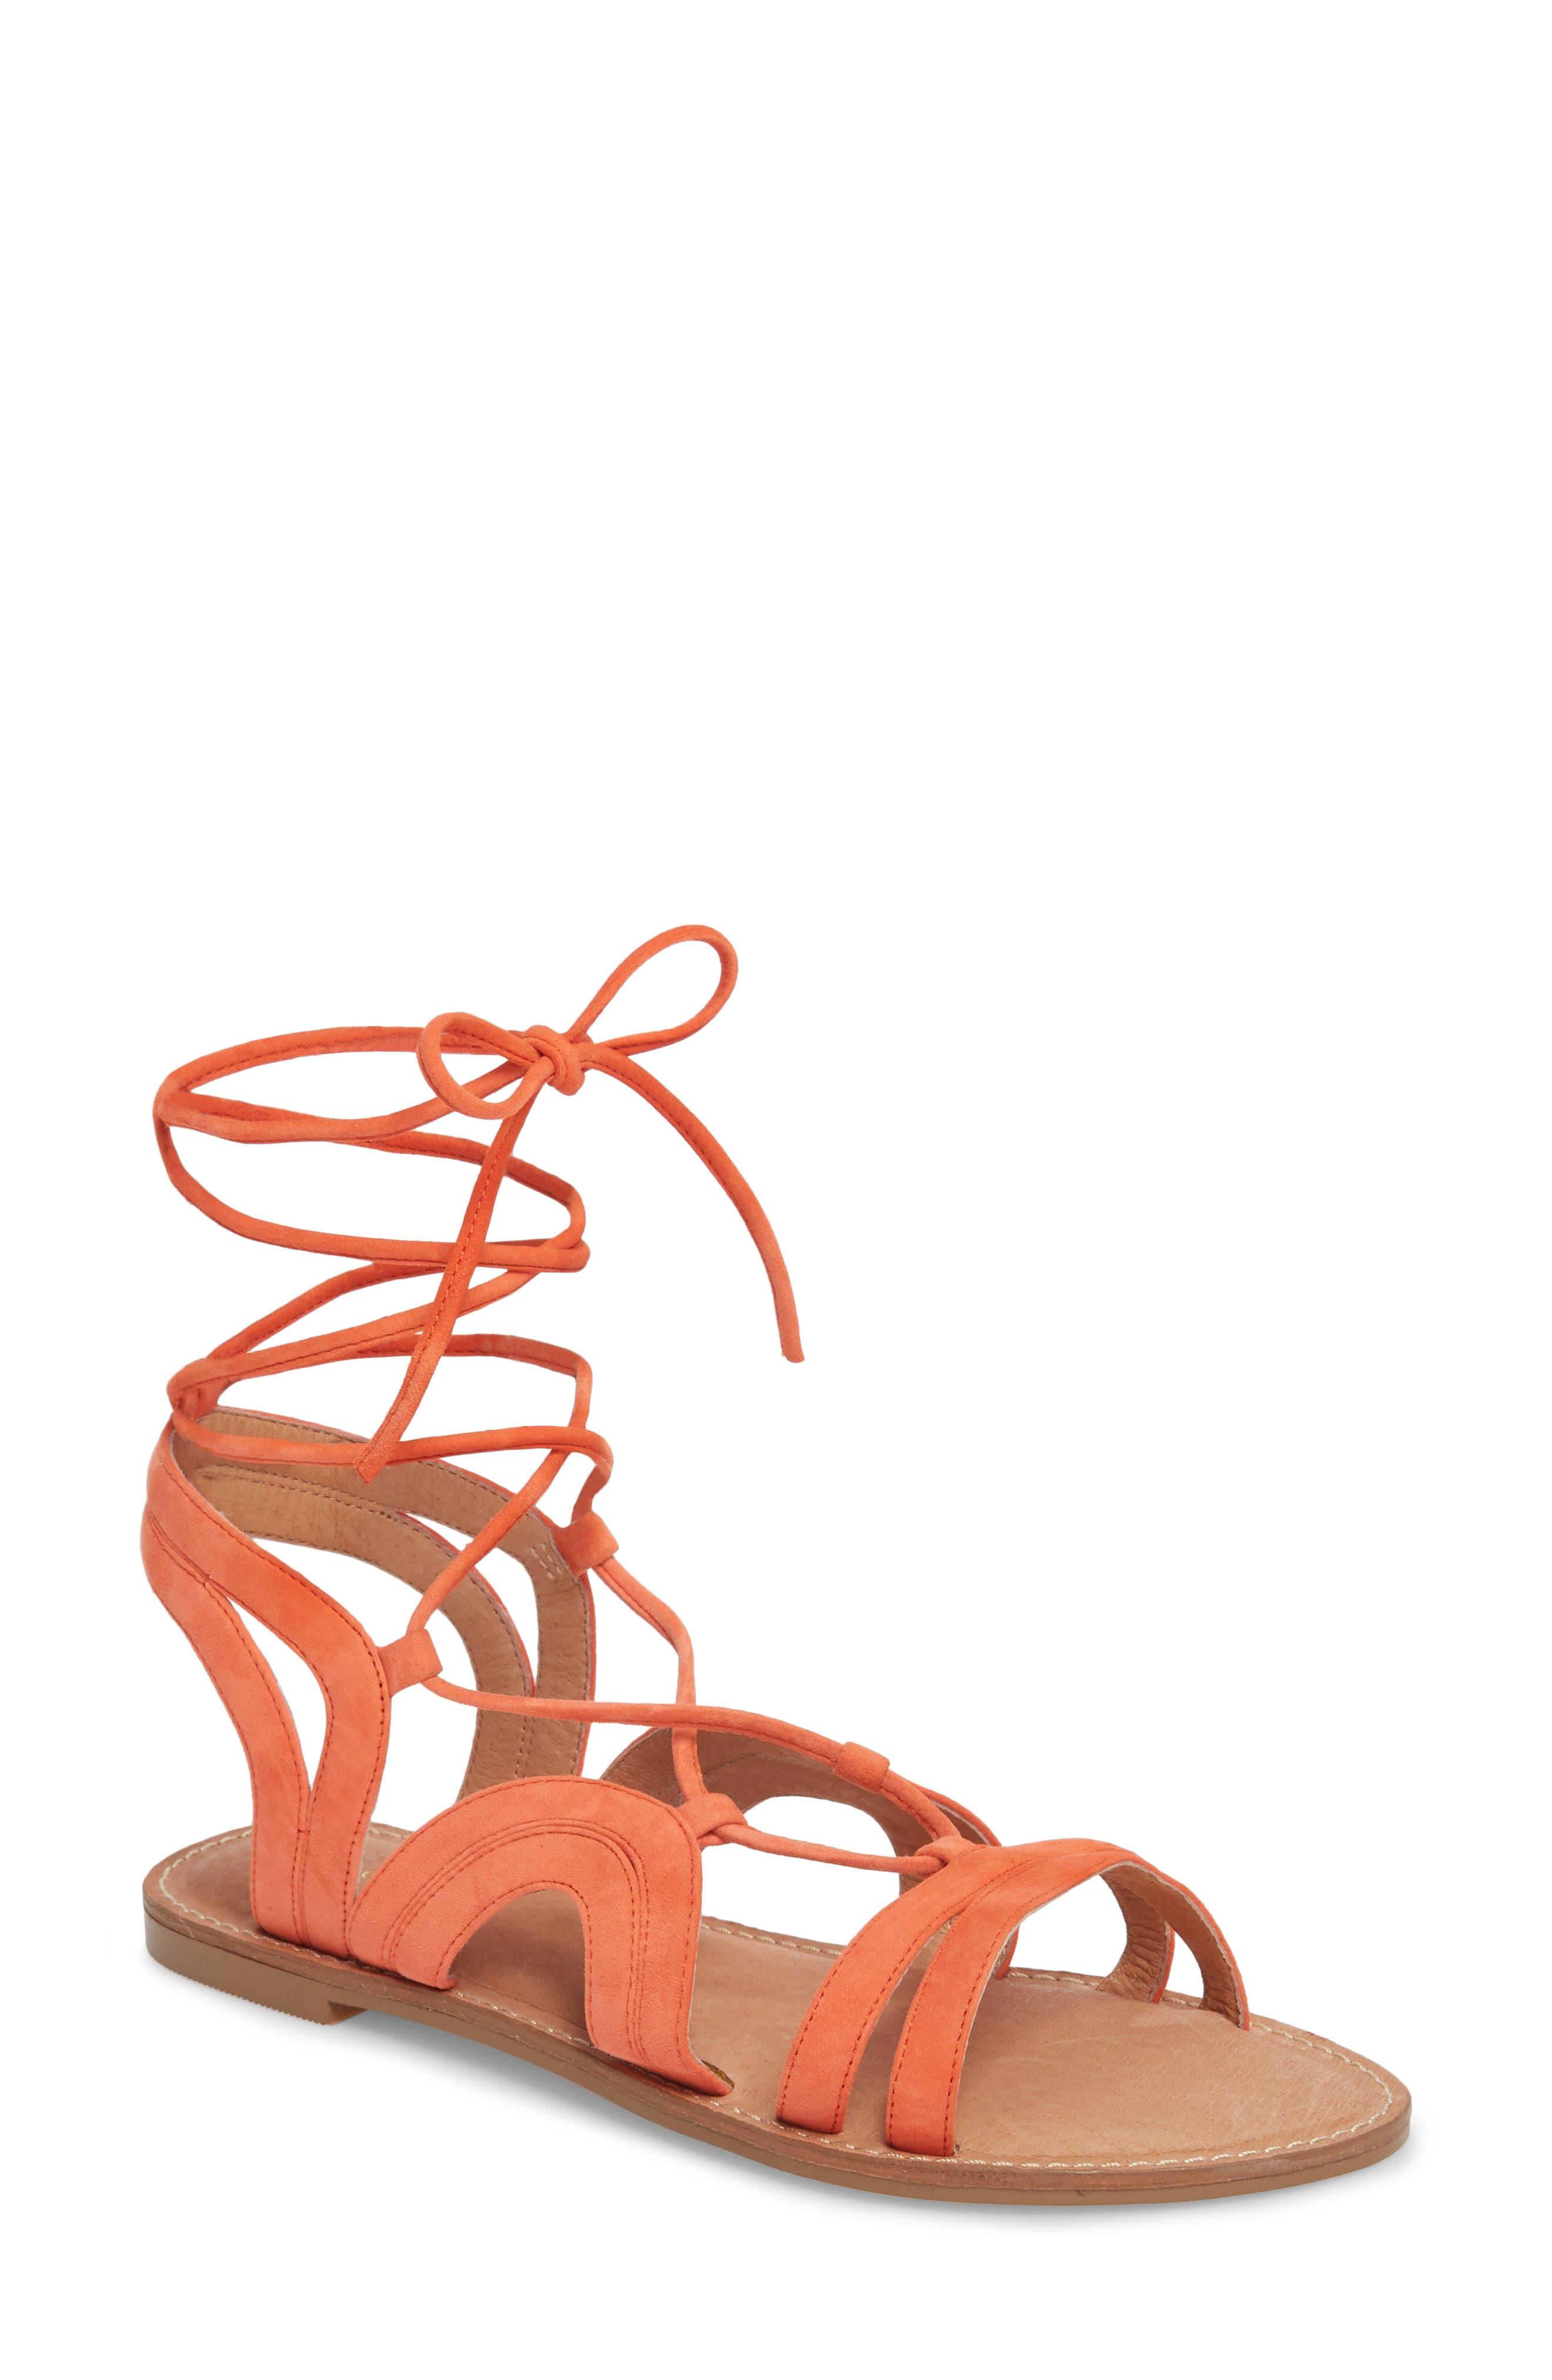 Lilian Gladiator Sandal,                             Main thumbnail 1, color,                             Orange Suede